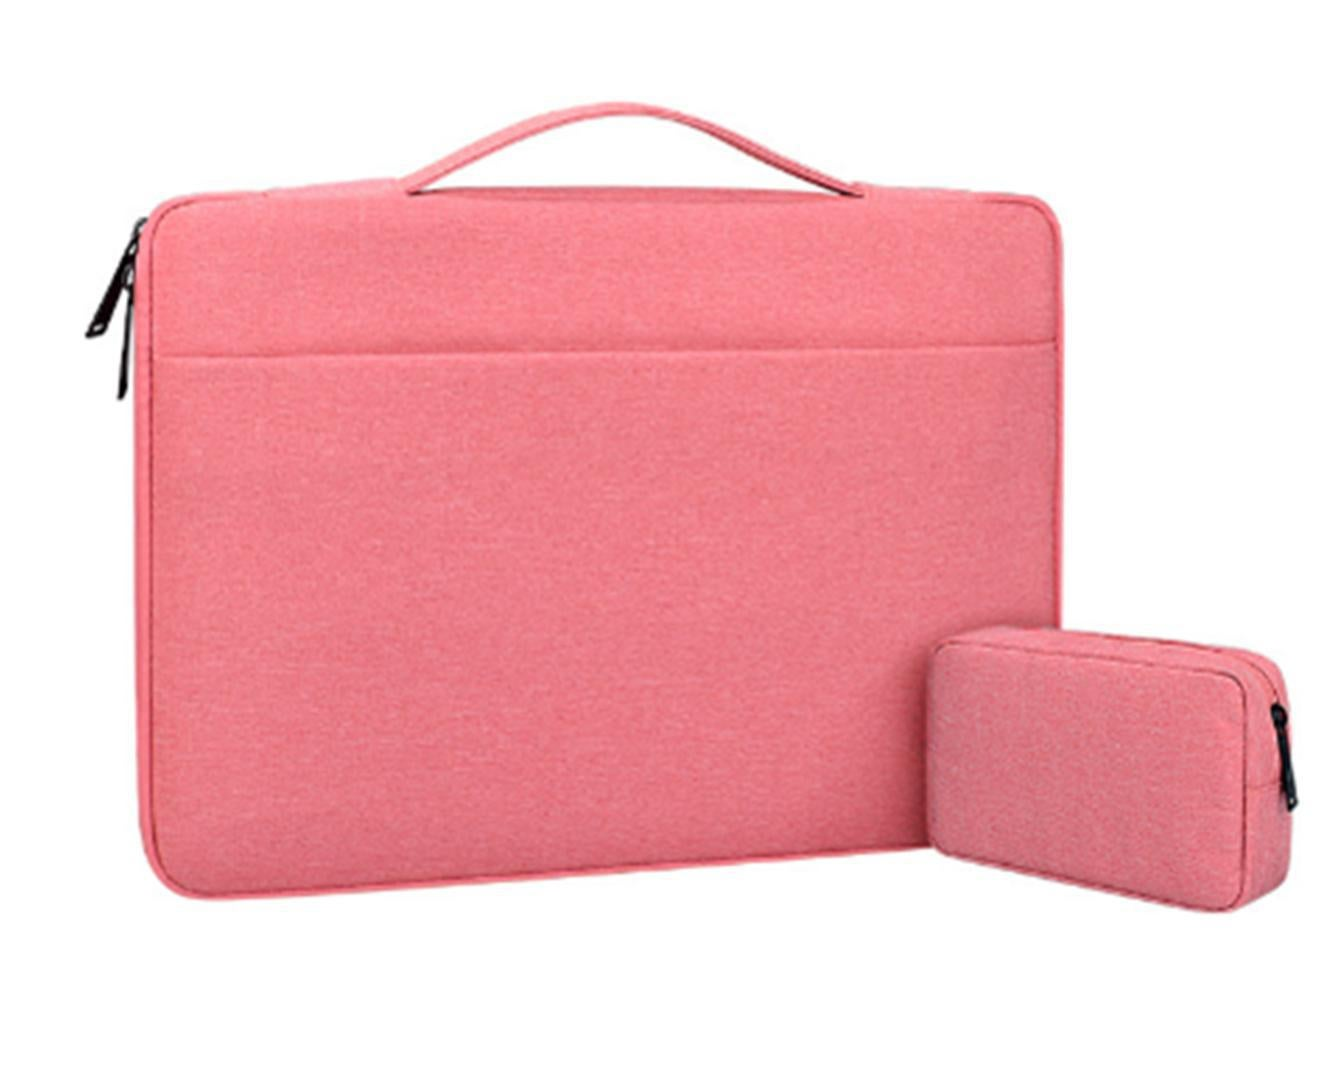 14.1 Inch Waterproof and Wear-resistant Laptop Bag Notebook Liner Bag Business Exhibition Bag-33#-Pink